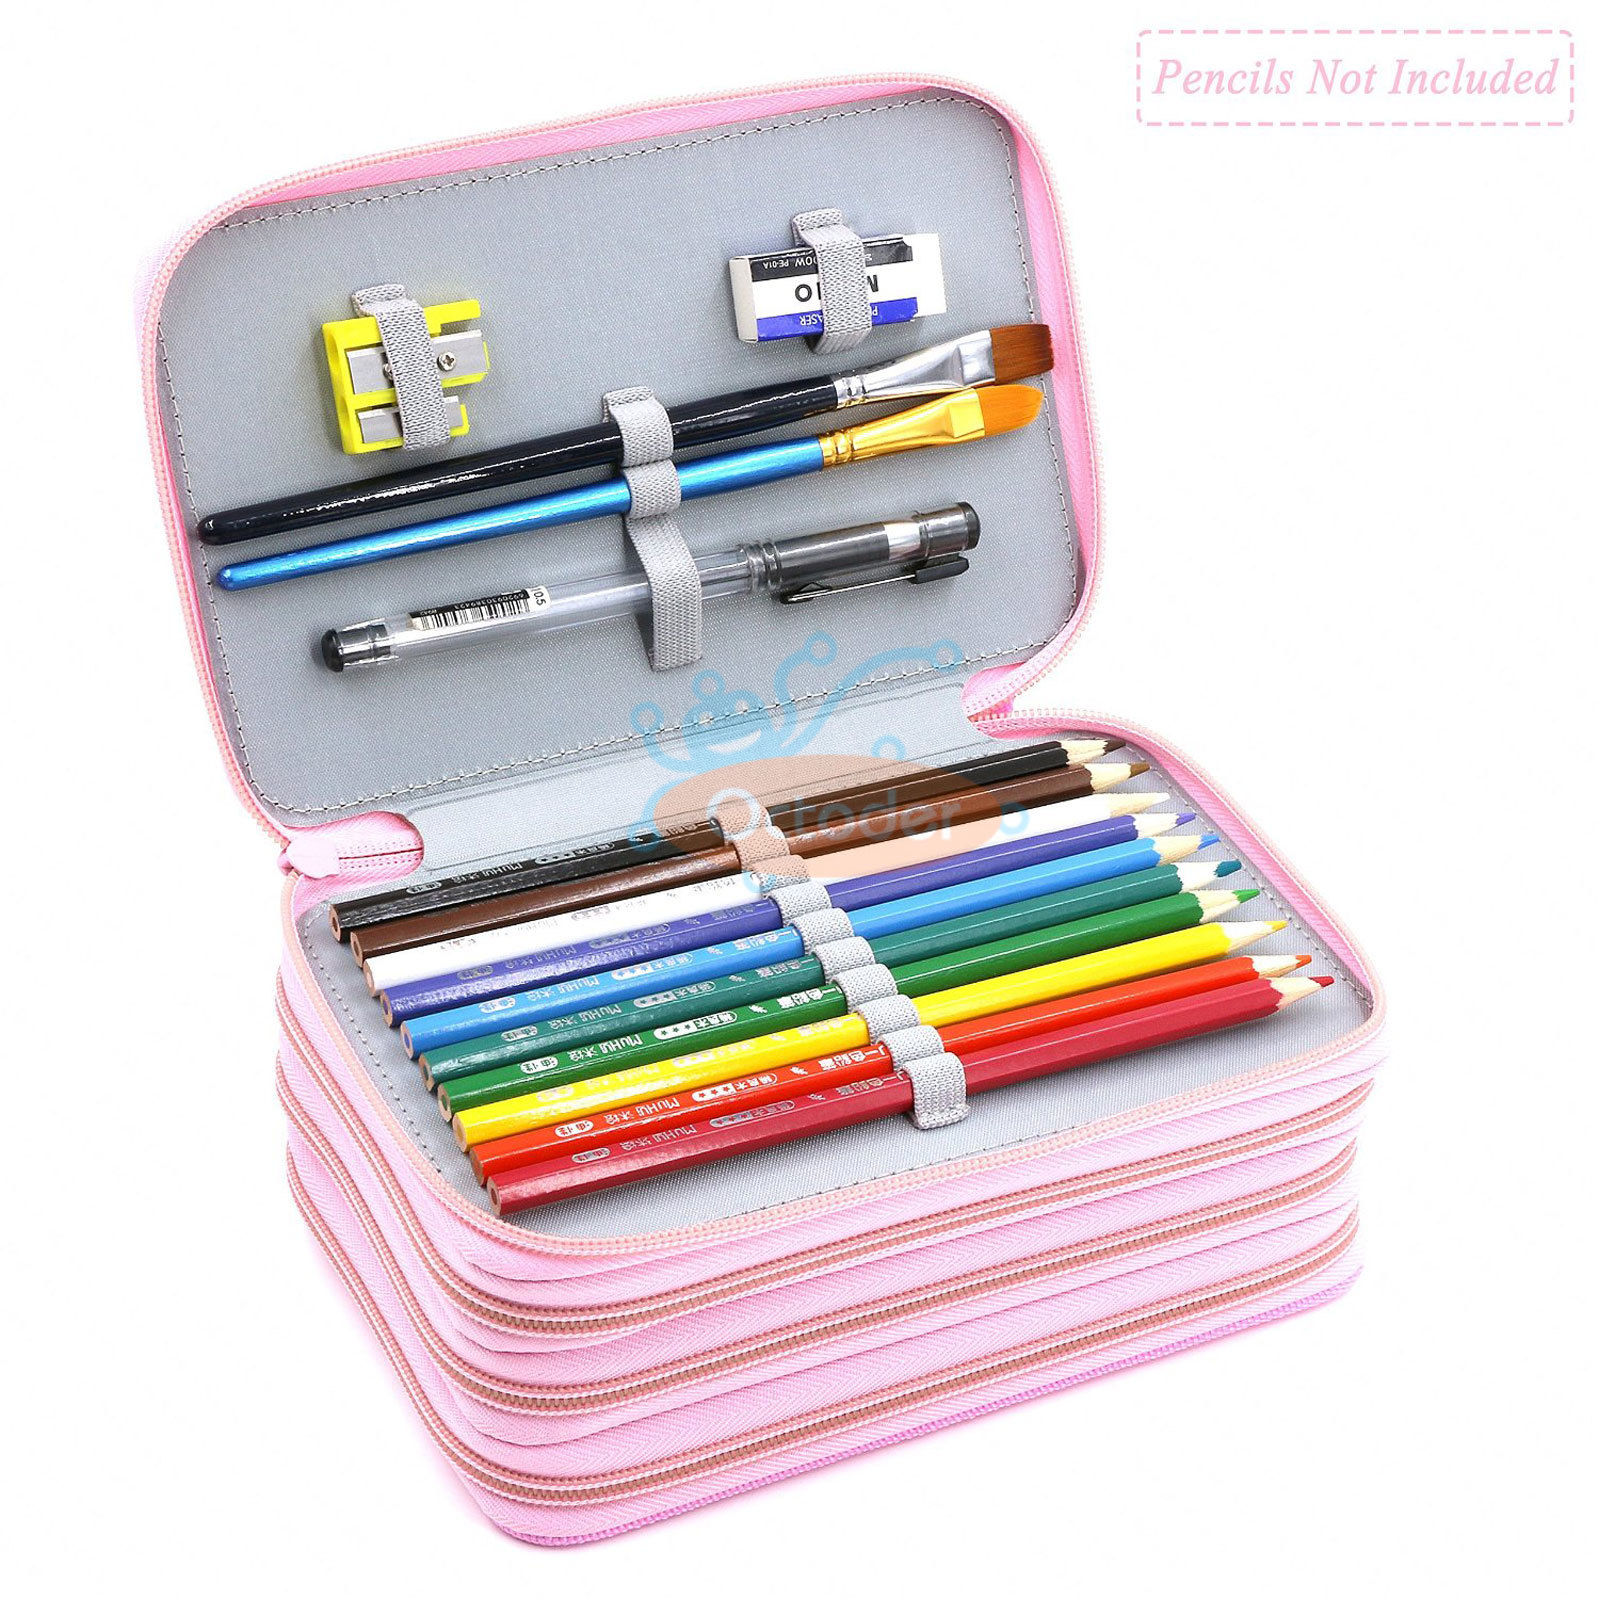 4-Layers-High-Capacity-Pencil-Brush-Case-Box-Pen-Pouch-Bag-Makeup-Storage-Bag thumbnail 21